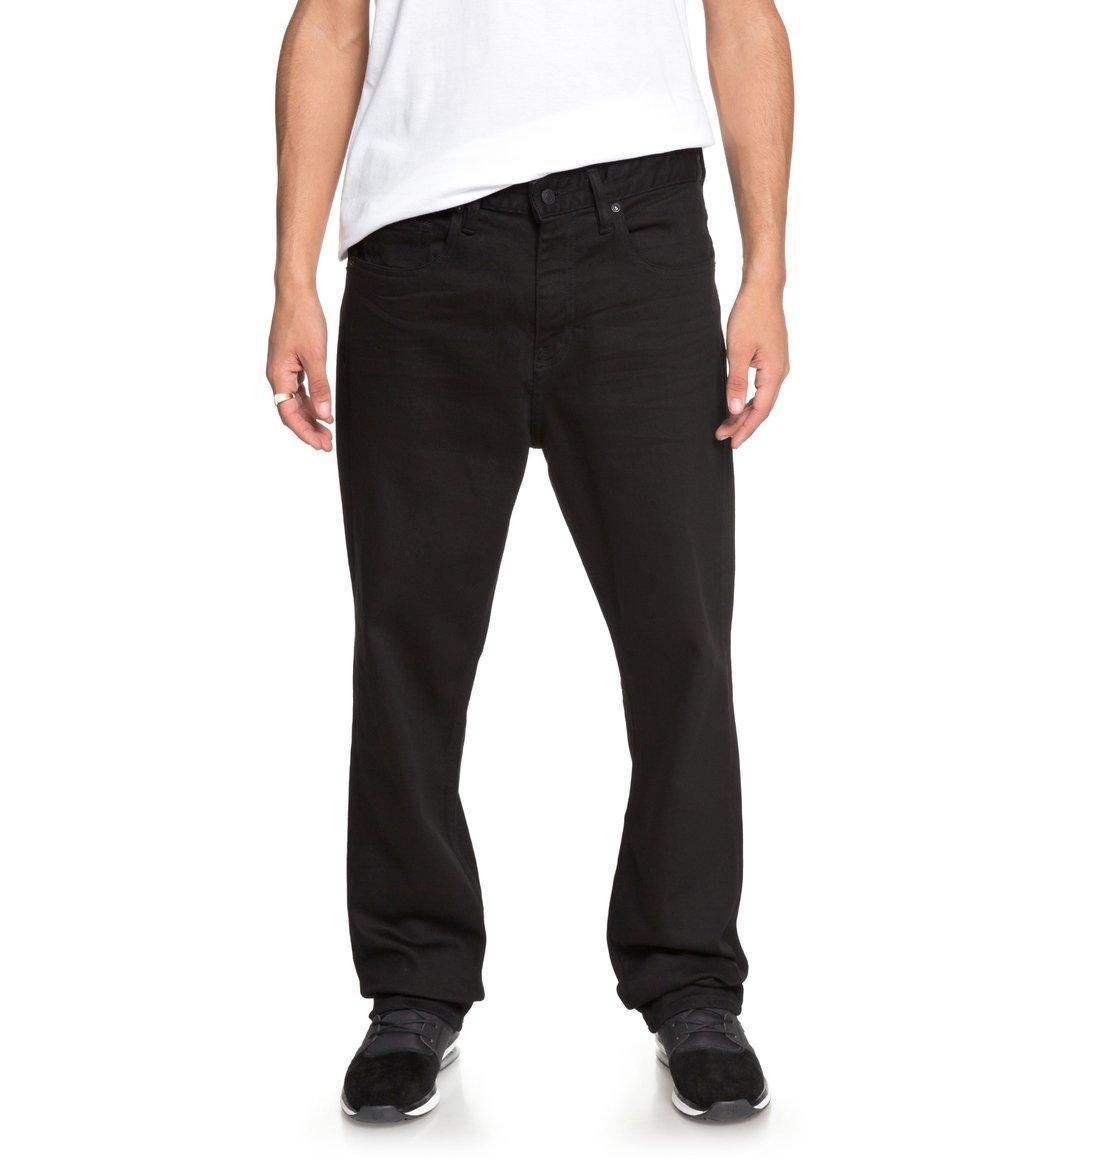 dc shoes Worker Black Rinse Straight - Jeans vestibilità Relaxed da Uomo - Black - DC Shoes fYZEI